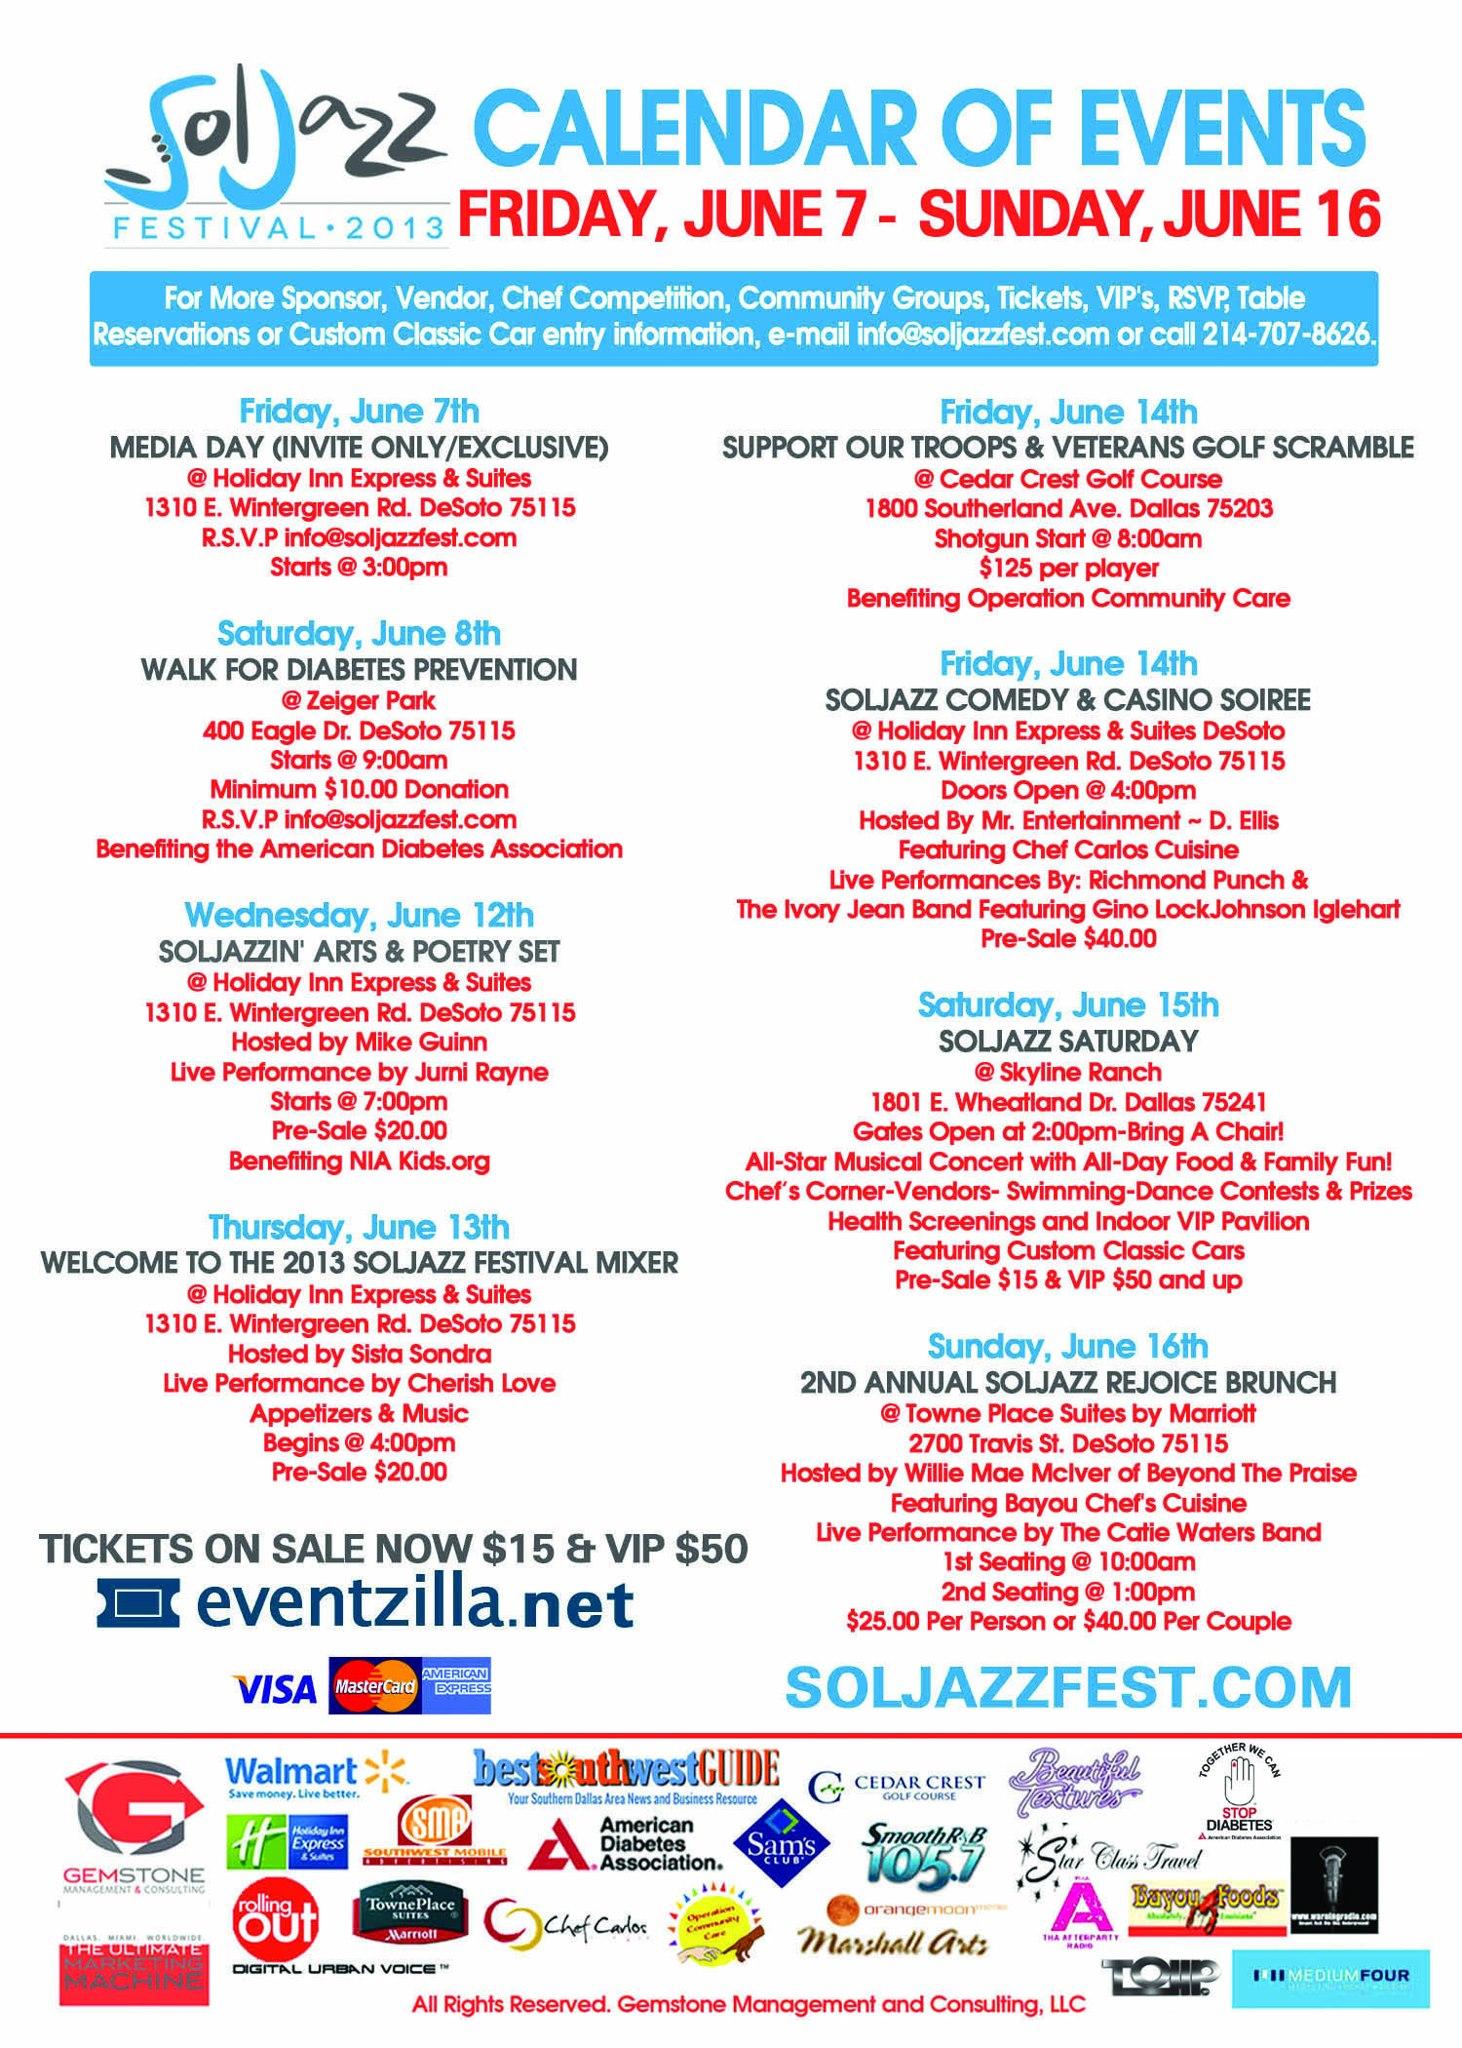 SolJazz Festival 2013 Calendar of Events